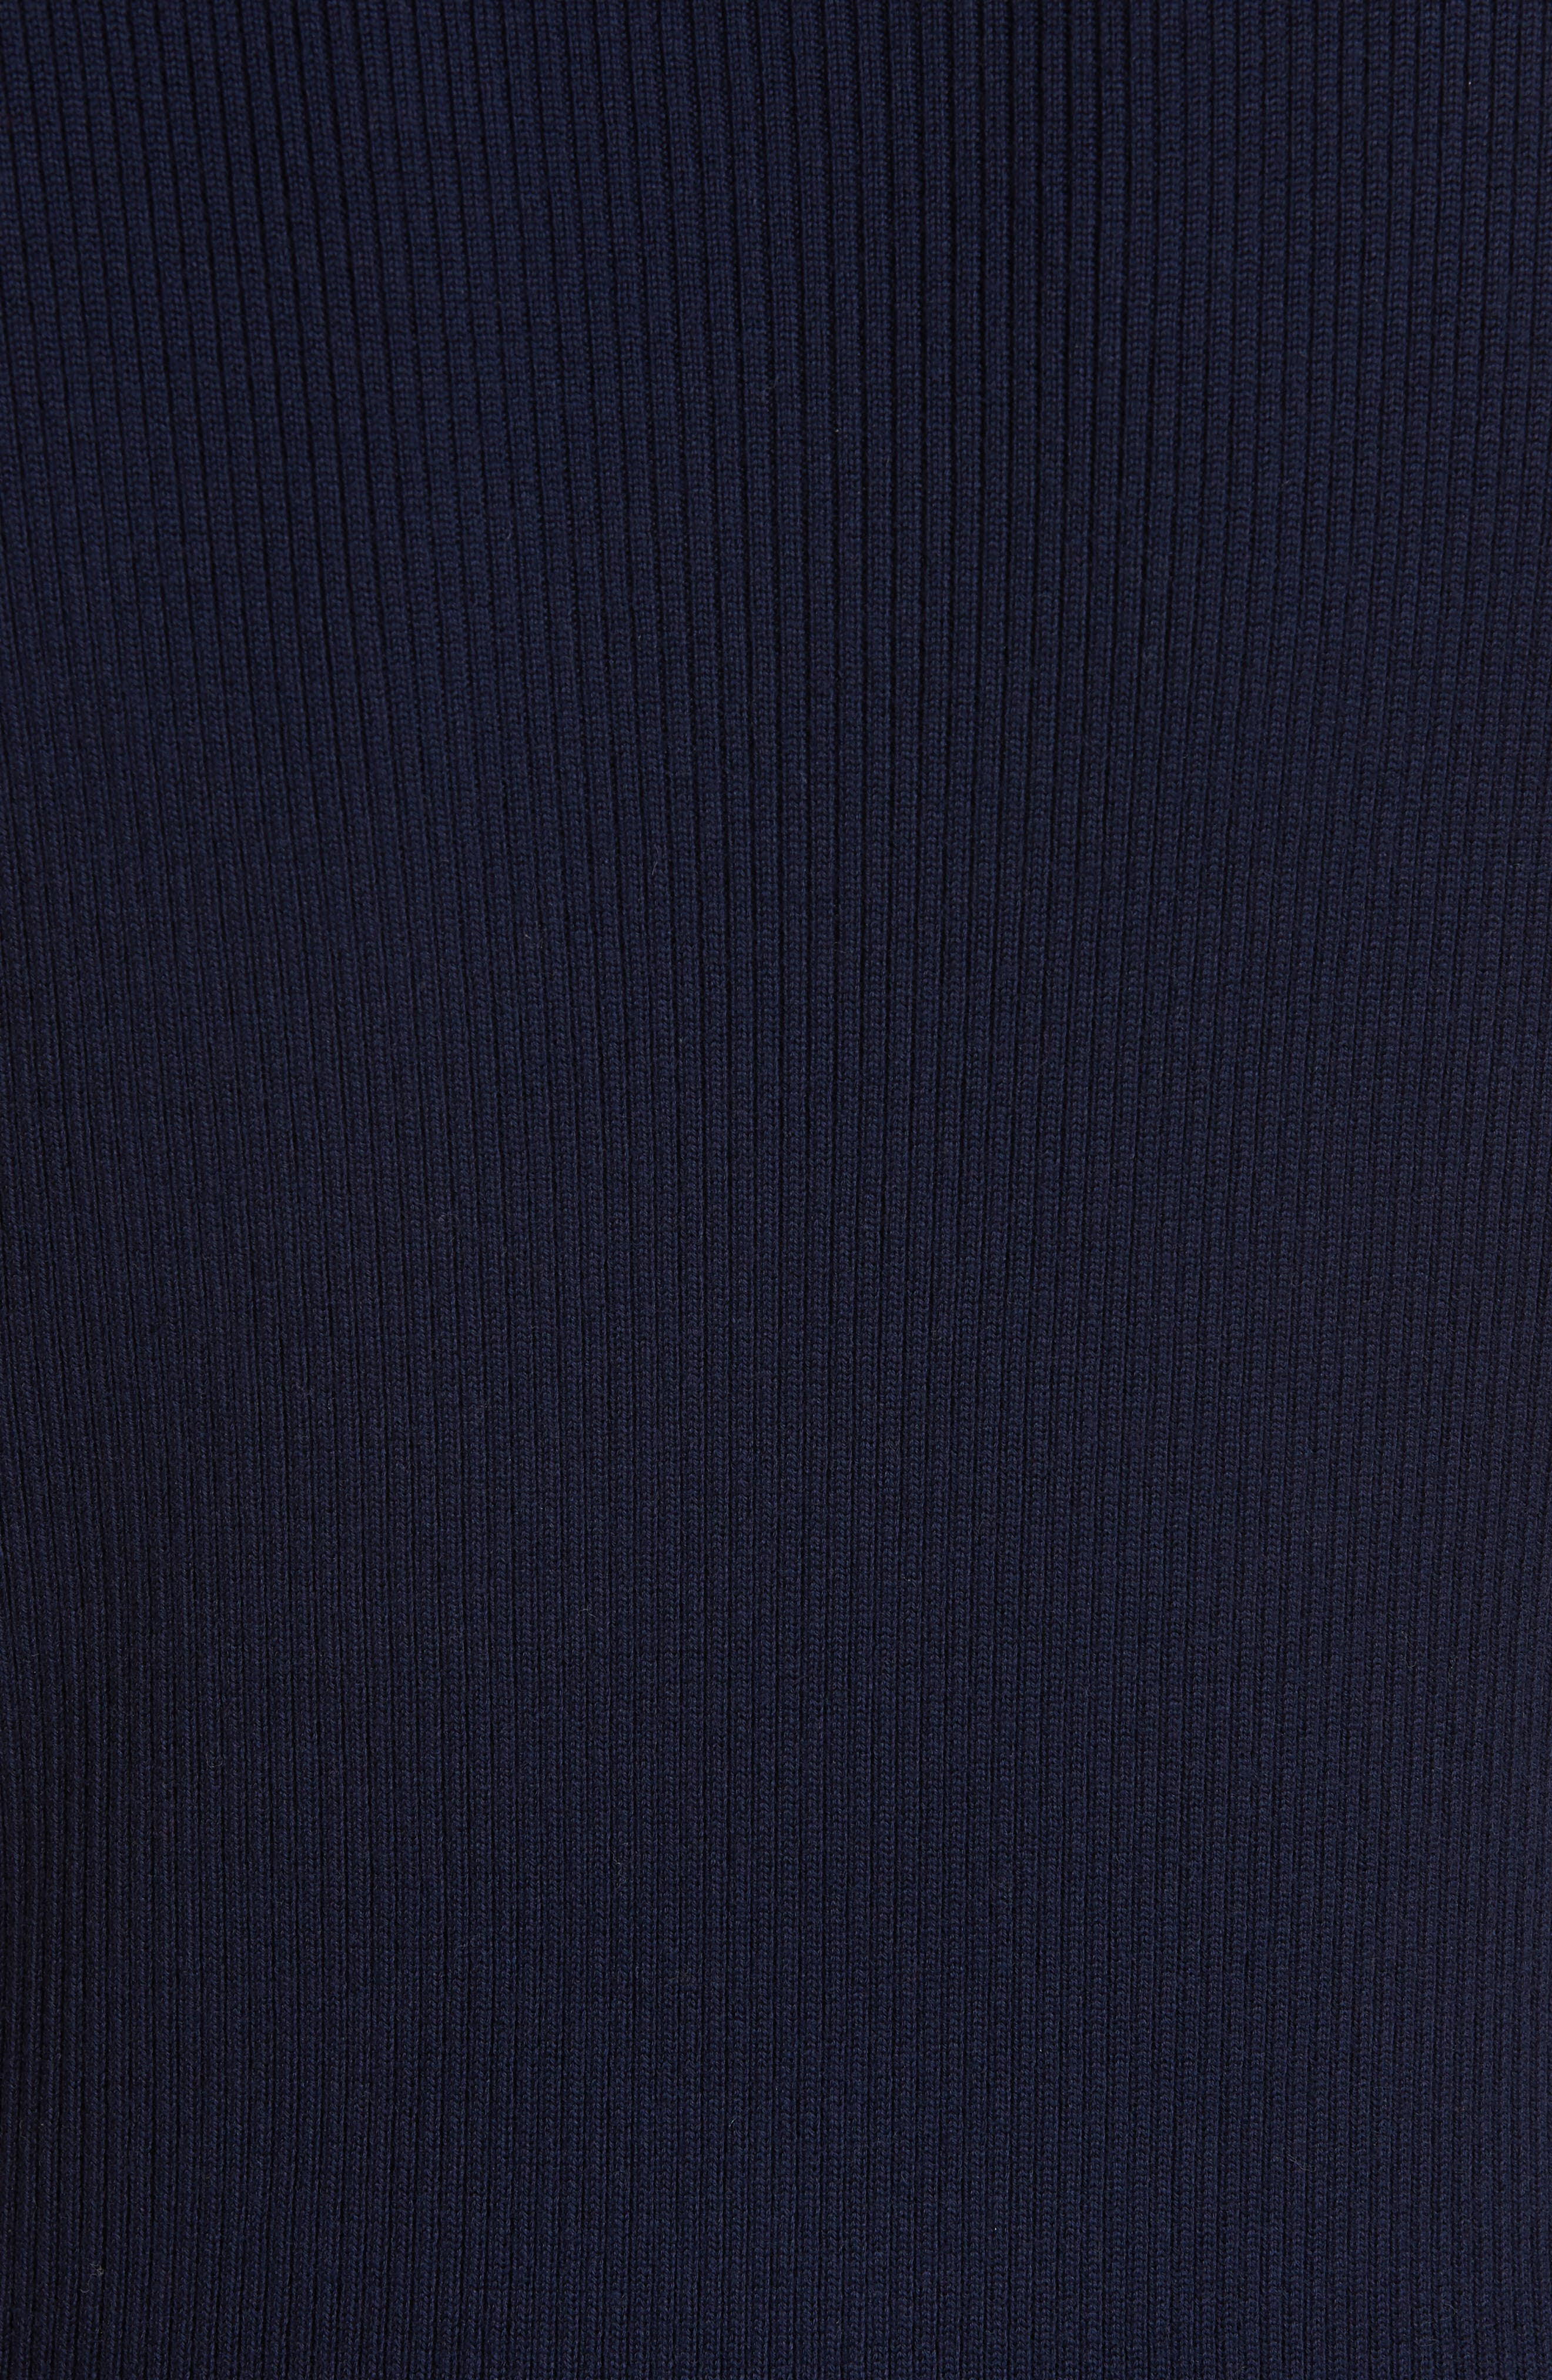 Midi Sweater Dress,                             Alternate thumbnail 5, color,                             NAVY/ GOLD